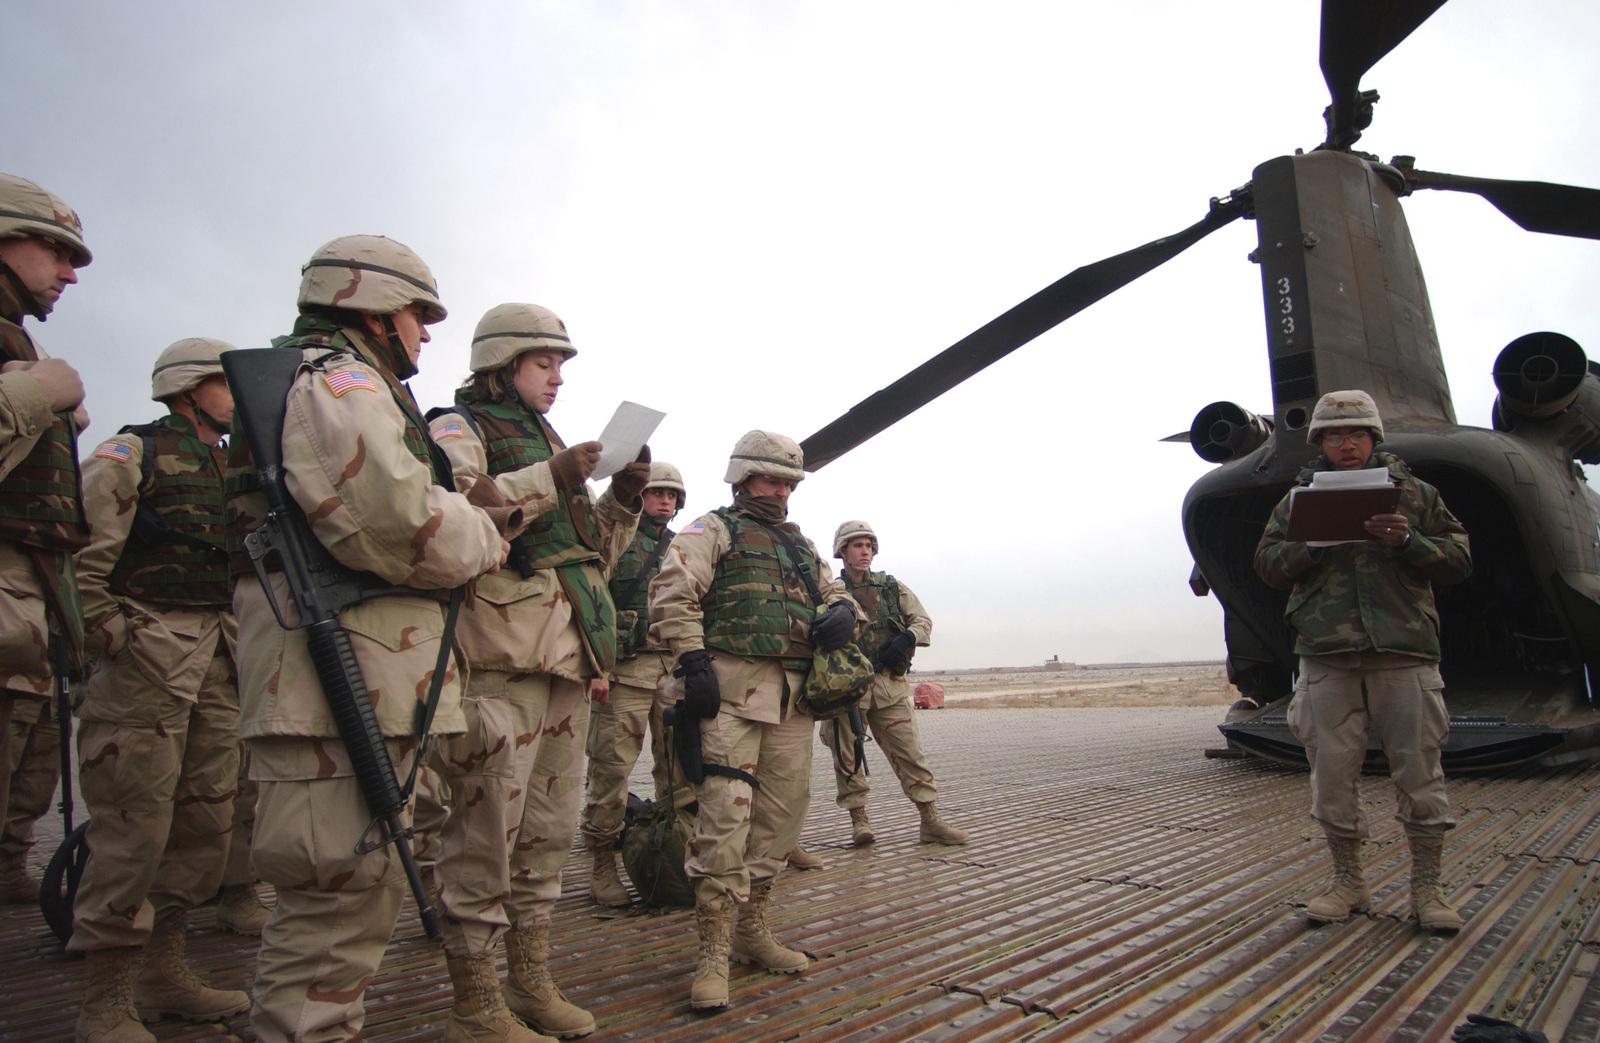 US Air Force (USAF) Major (MAJ) Darrell Small, 48th Combat Support Hospital, Bagram Air Base (AB),